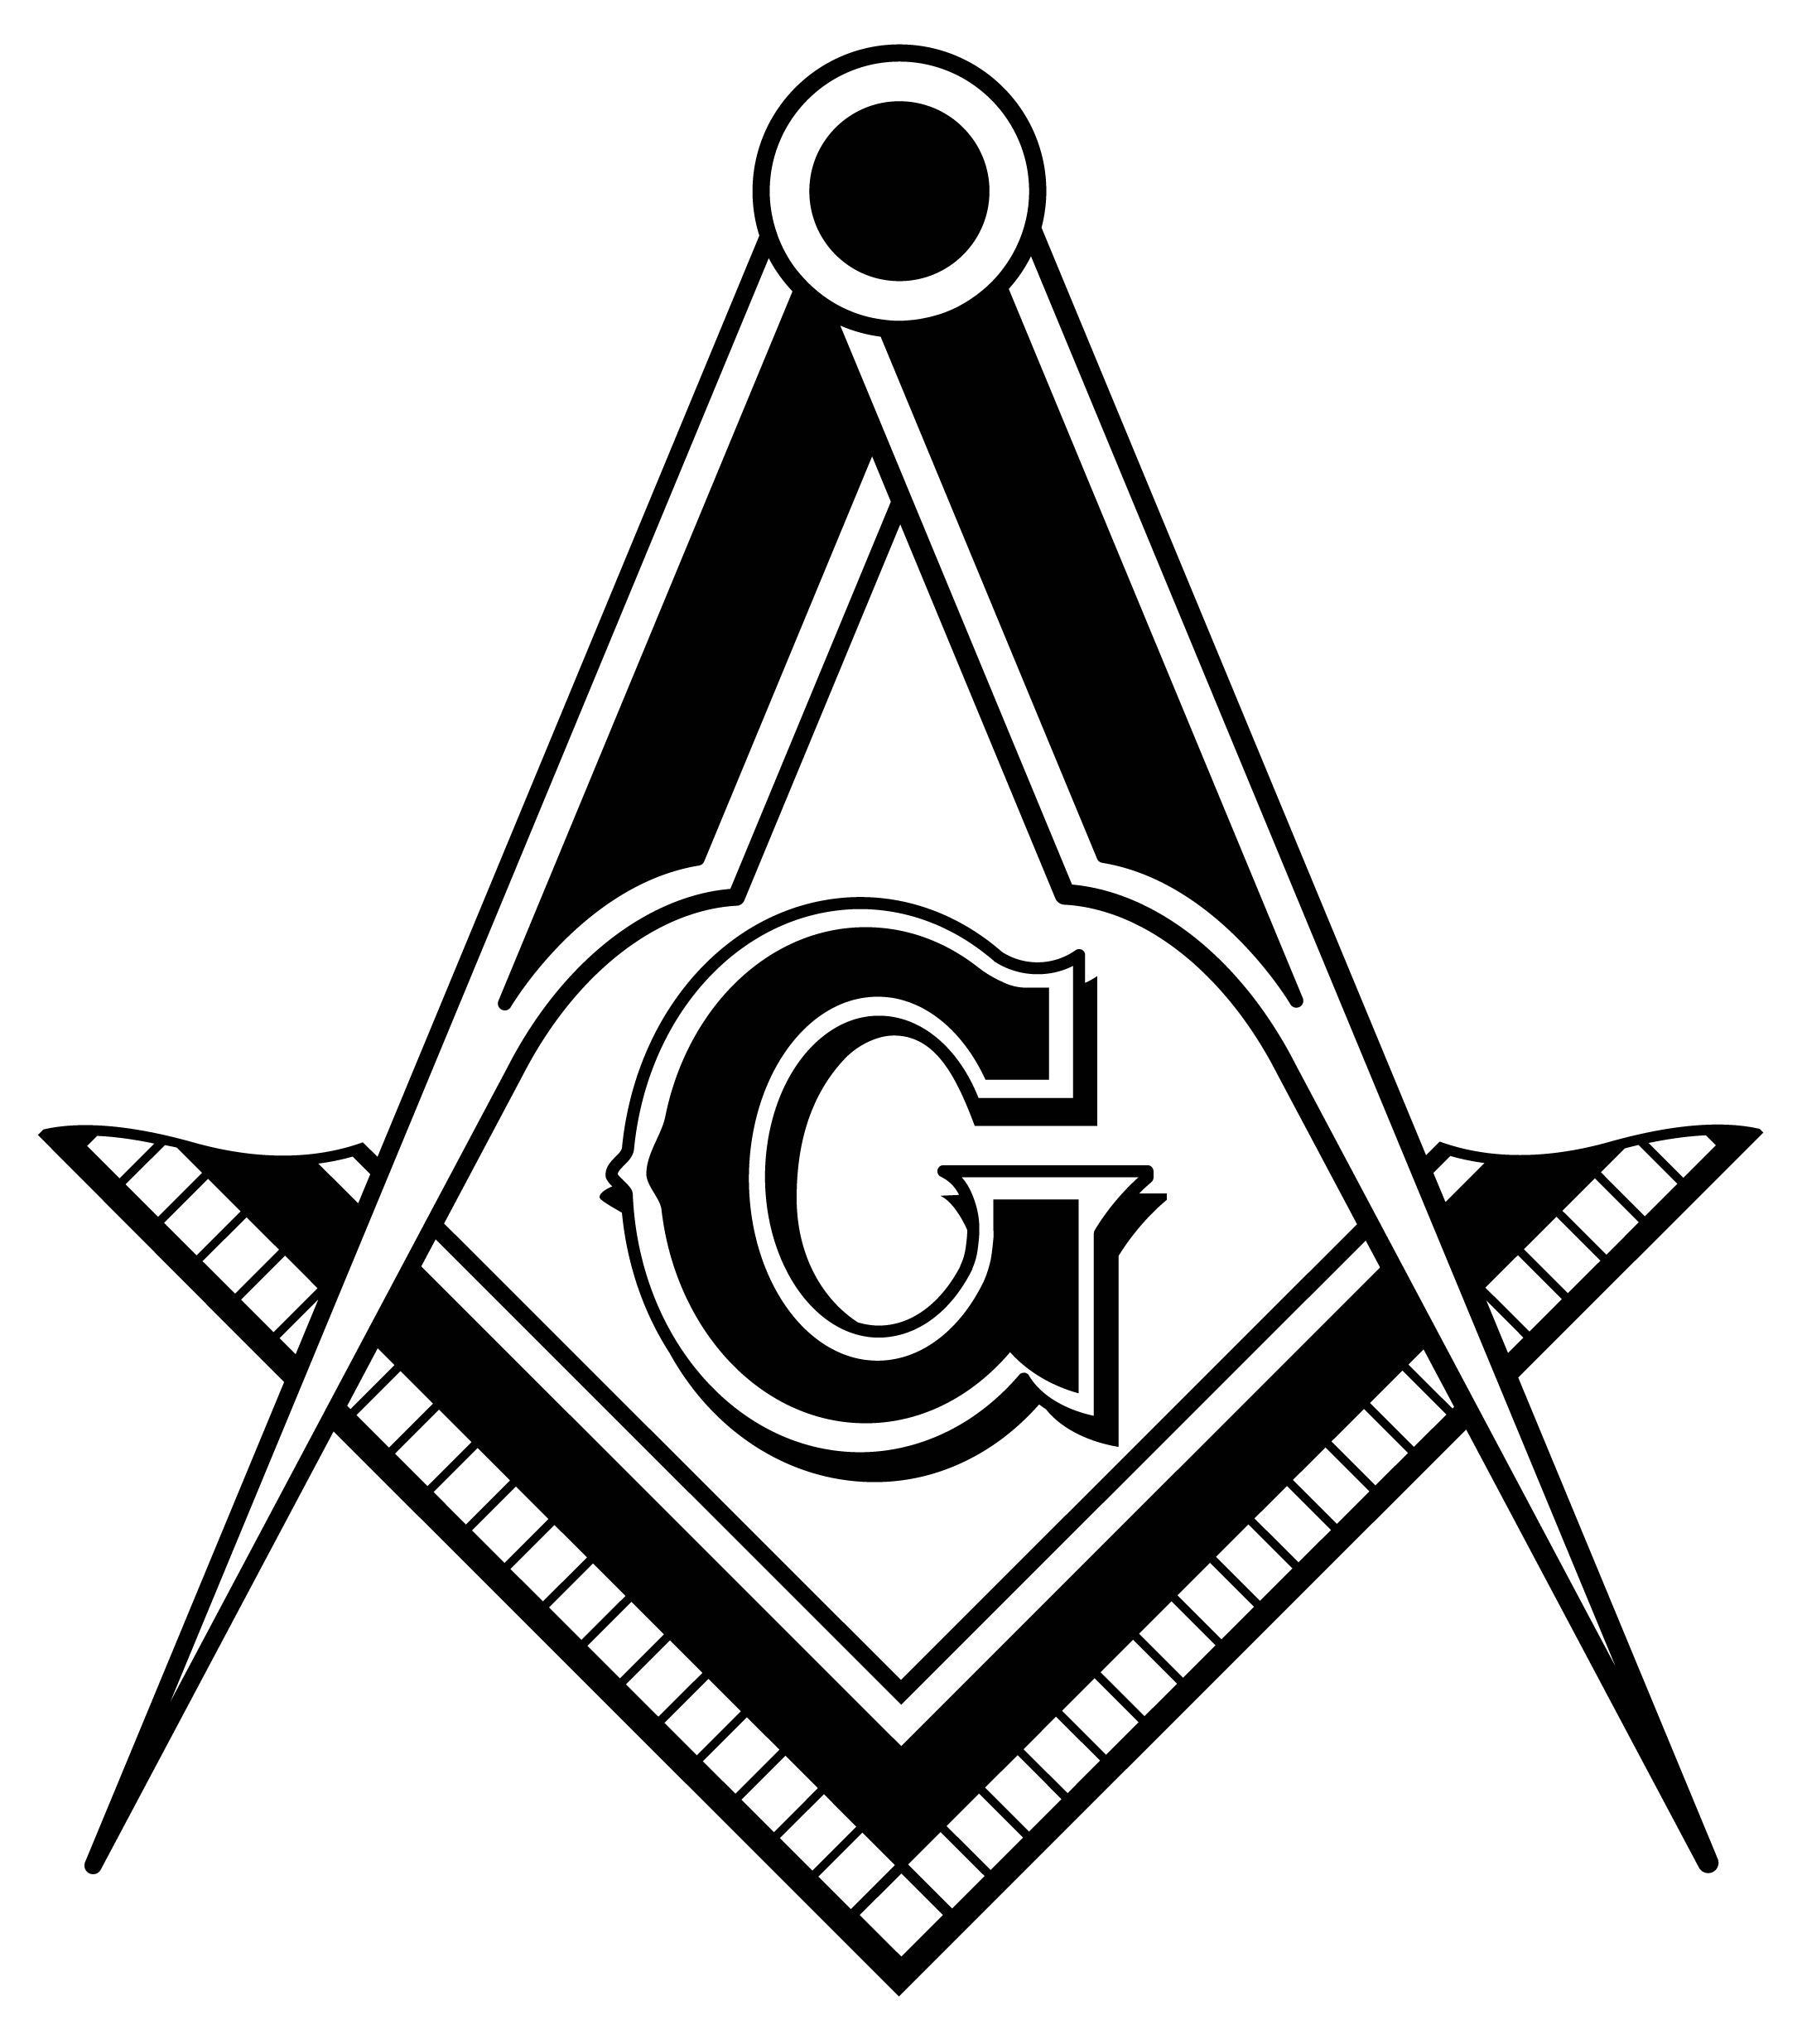 Grand Lodge Square and Compass black